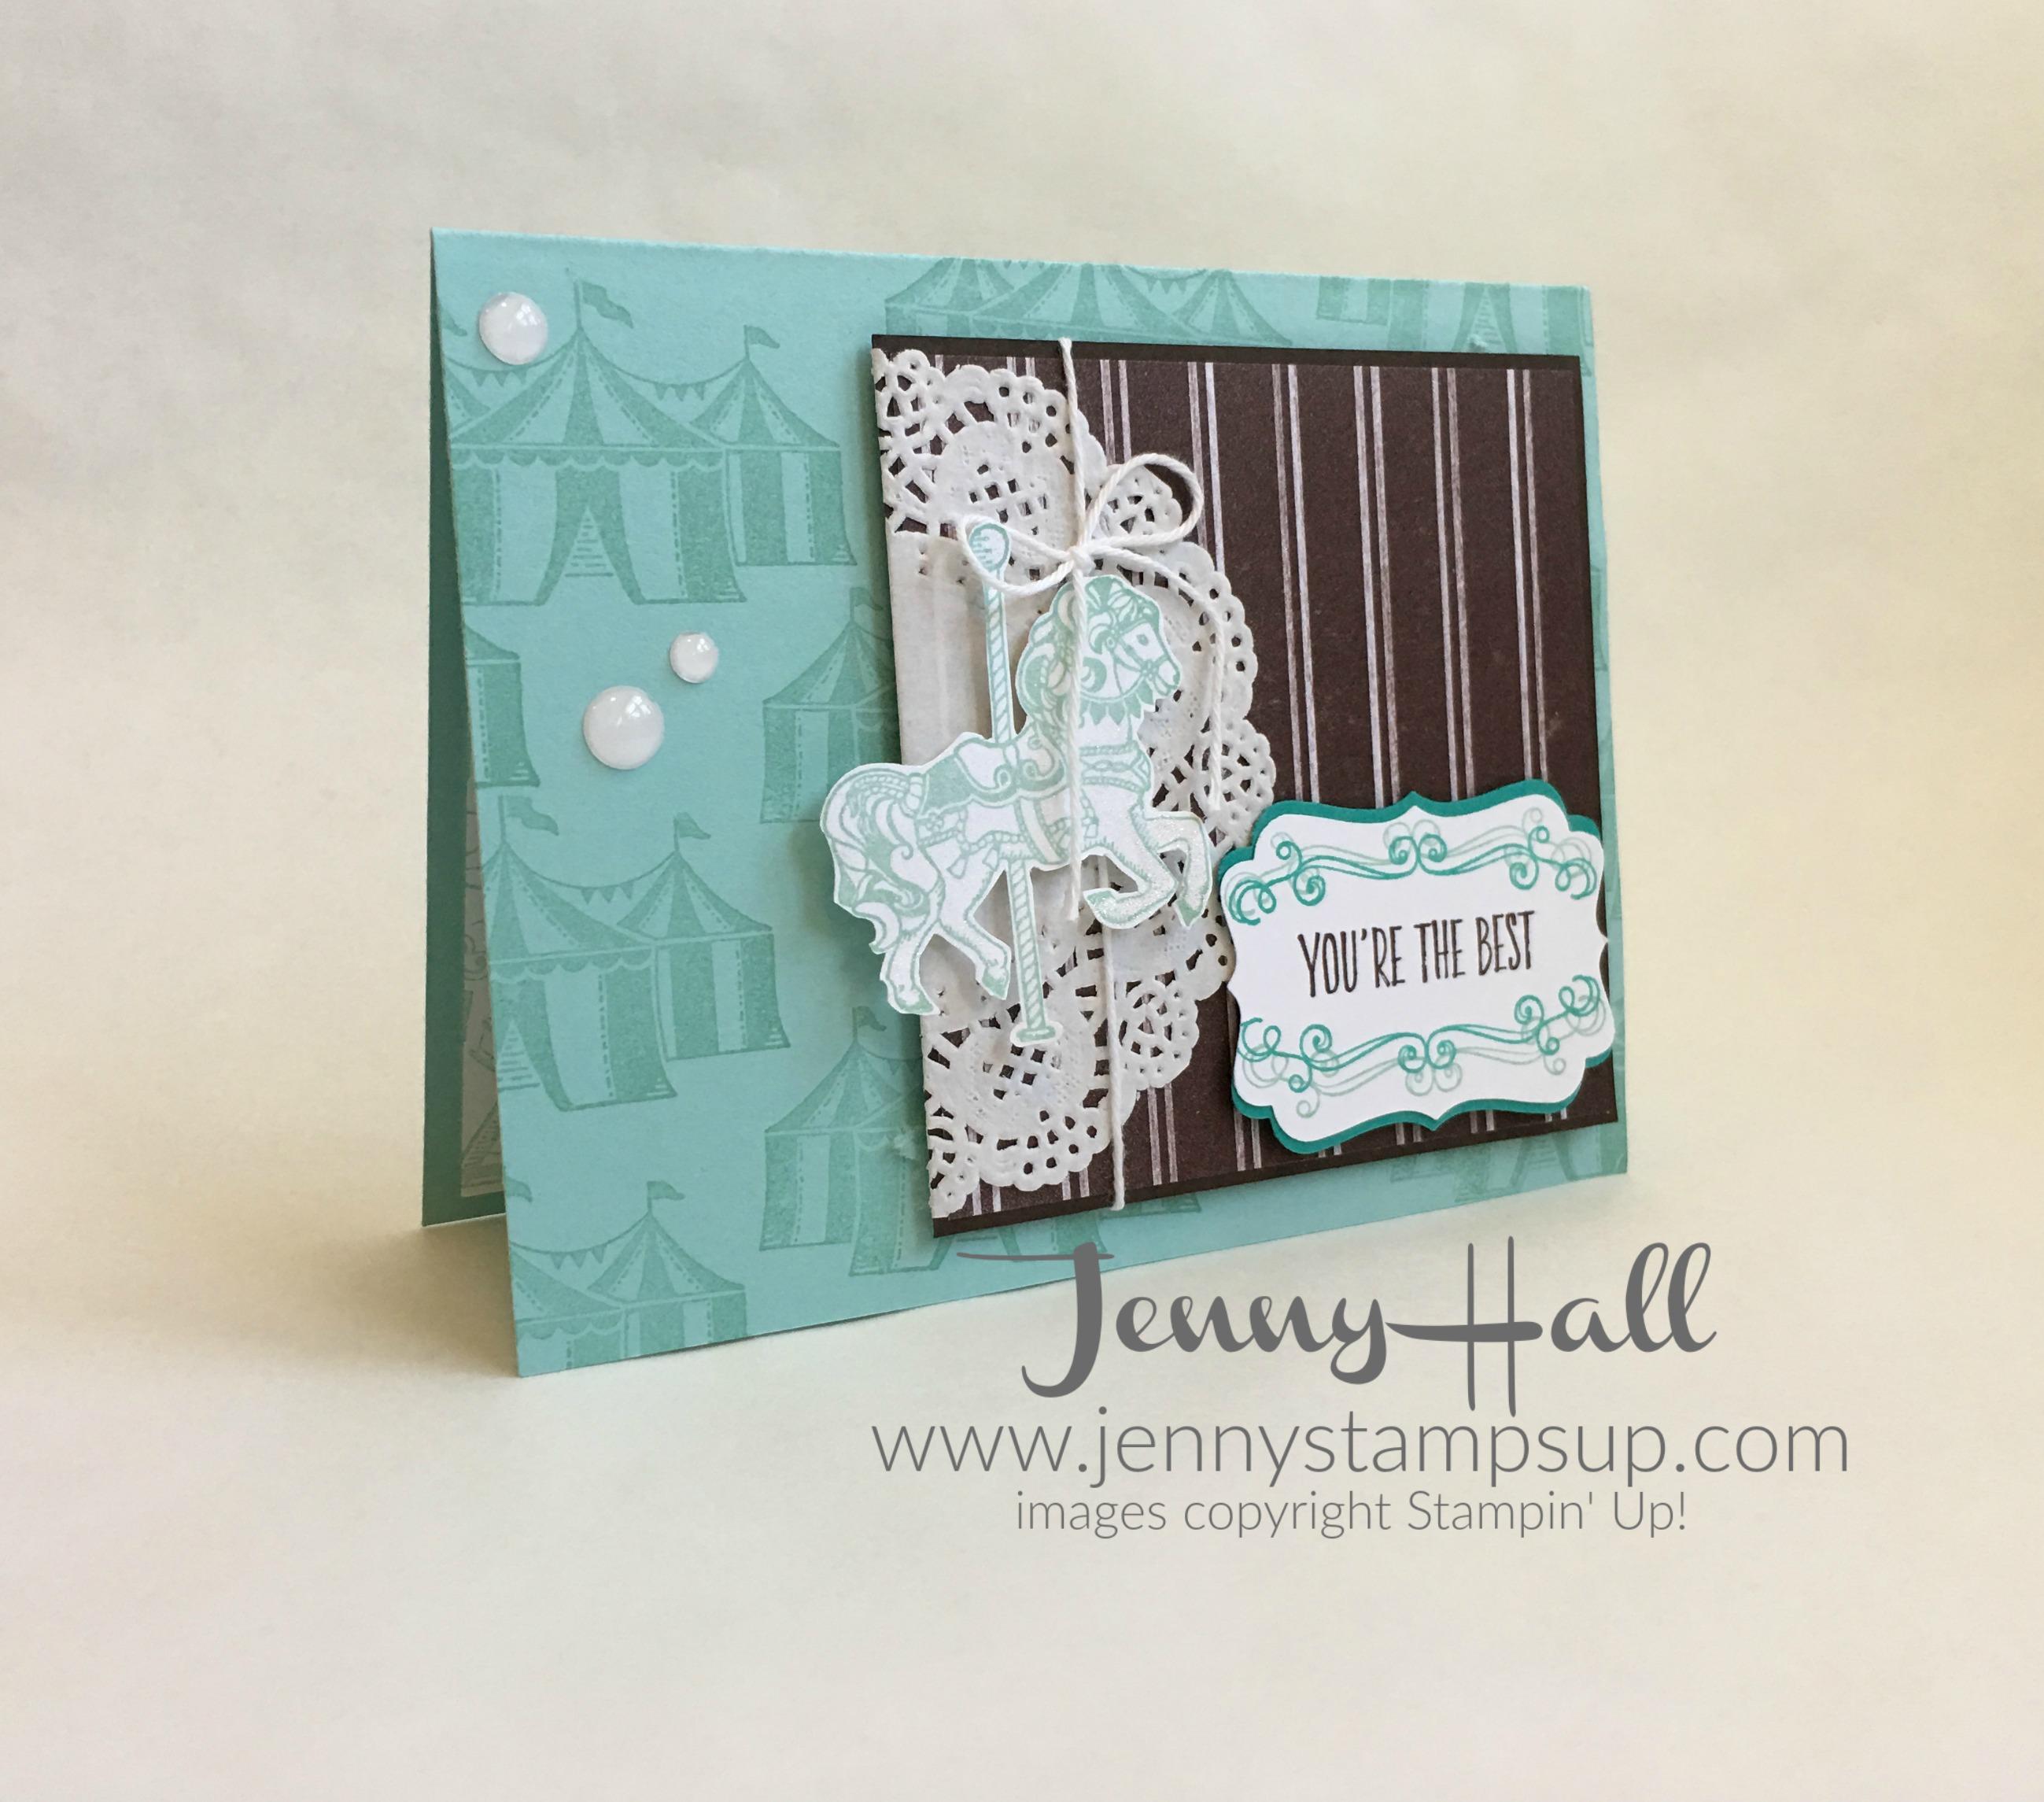 Carousel Birthday card by Jenny Hall at www.jennyhalldesign.com